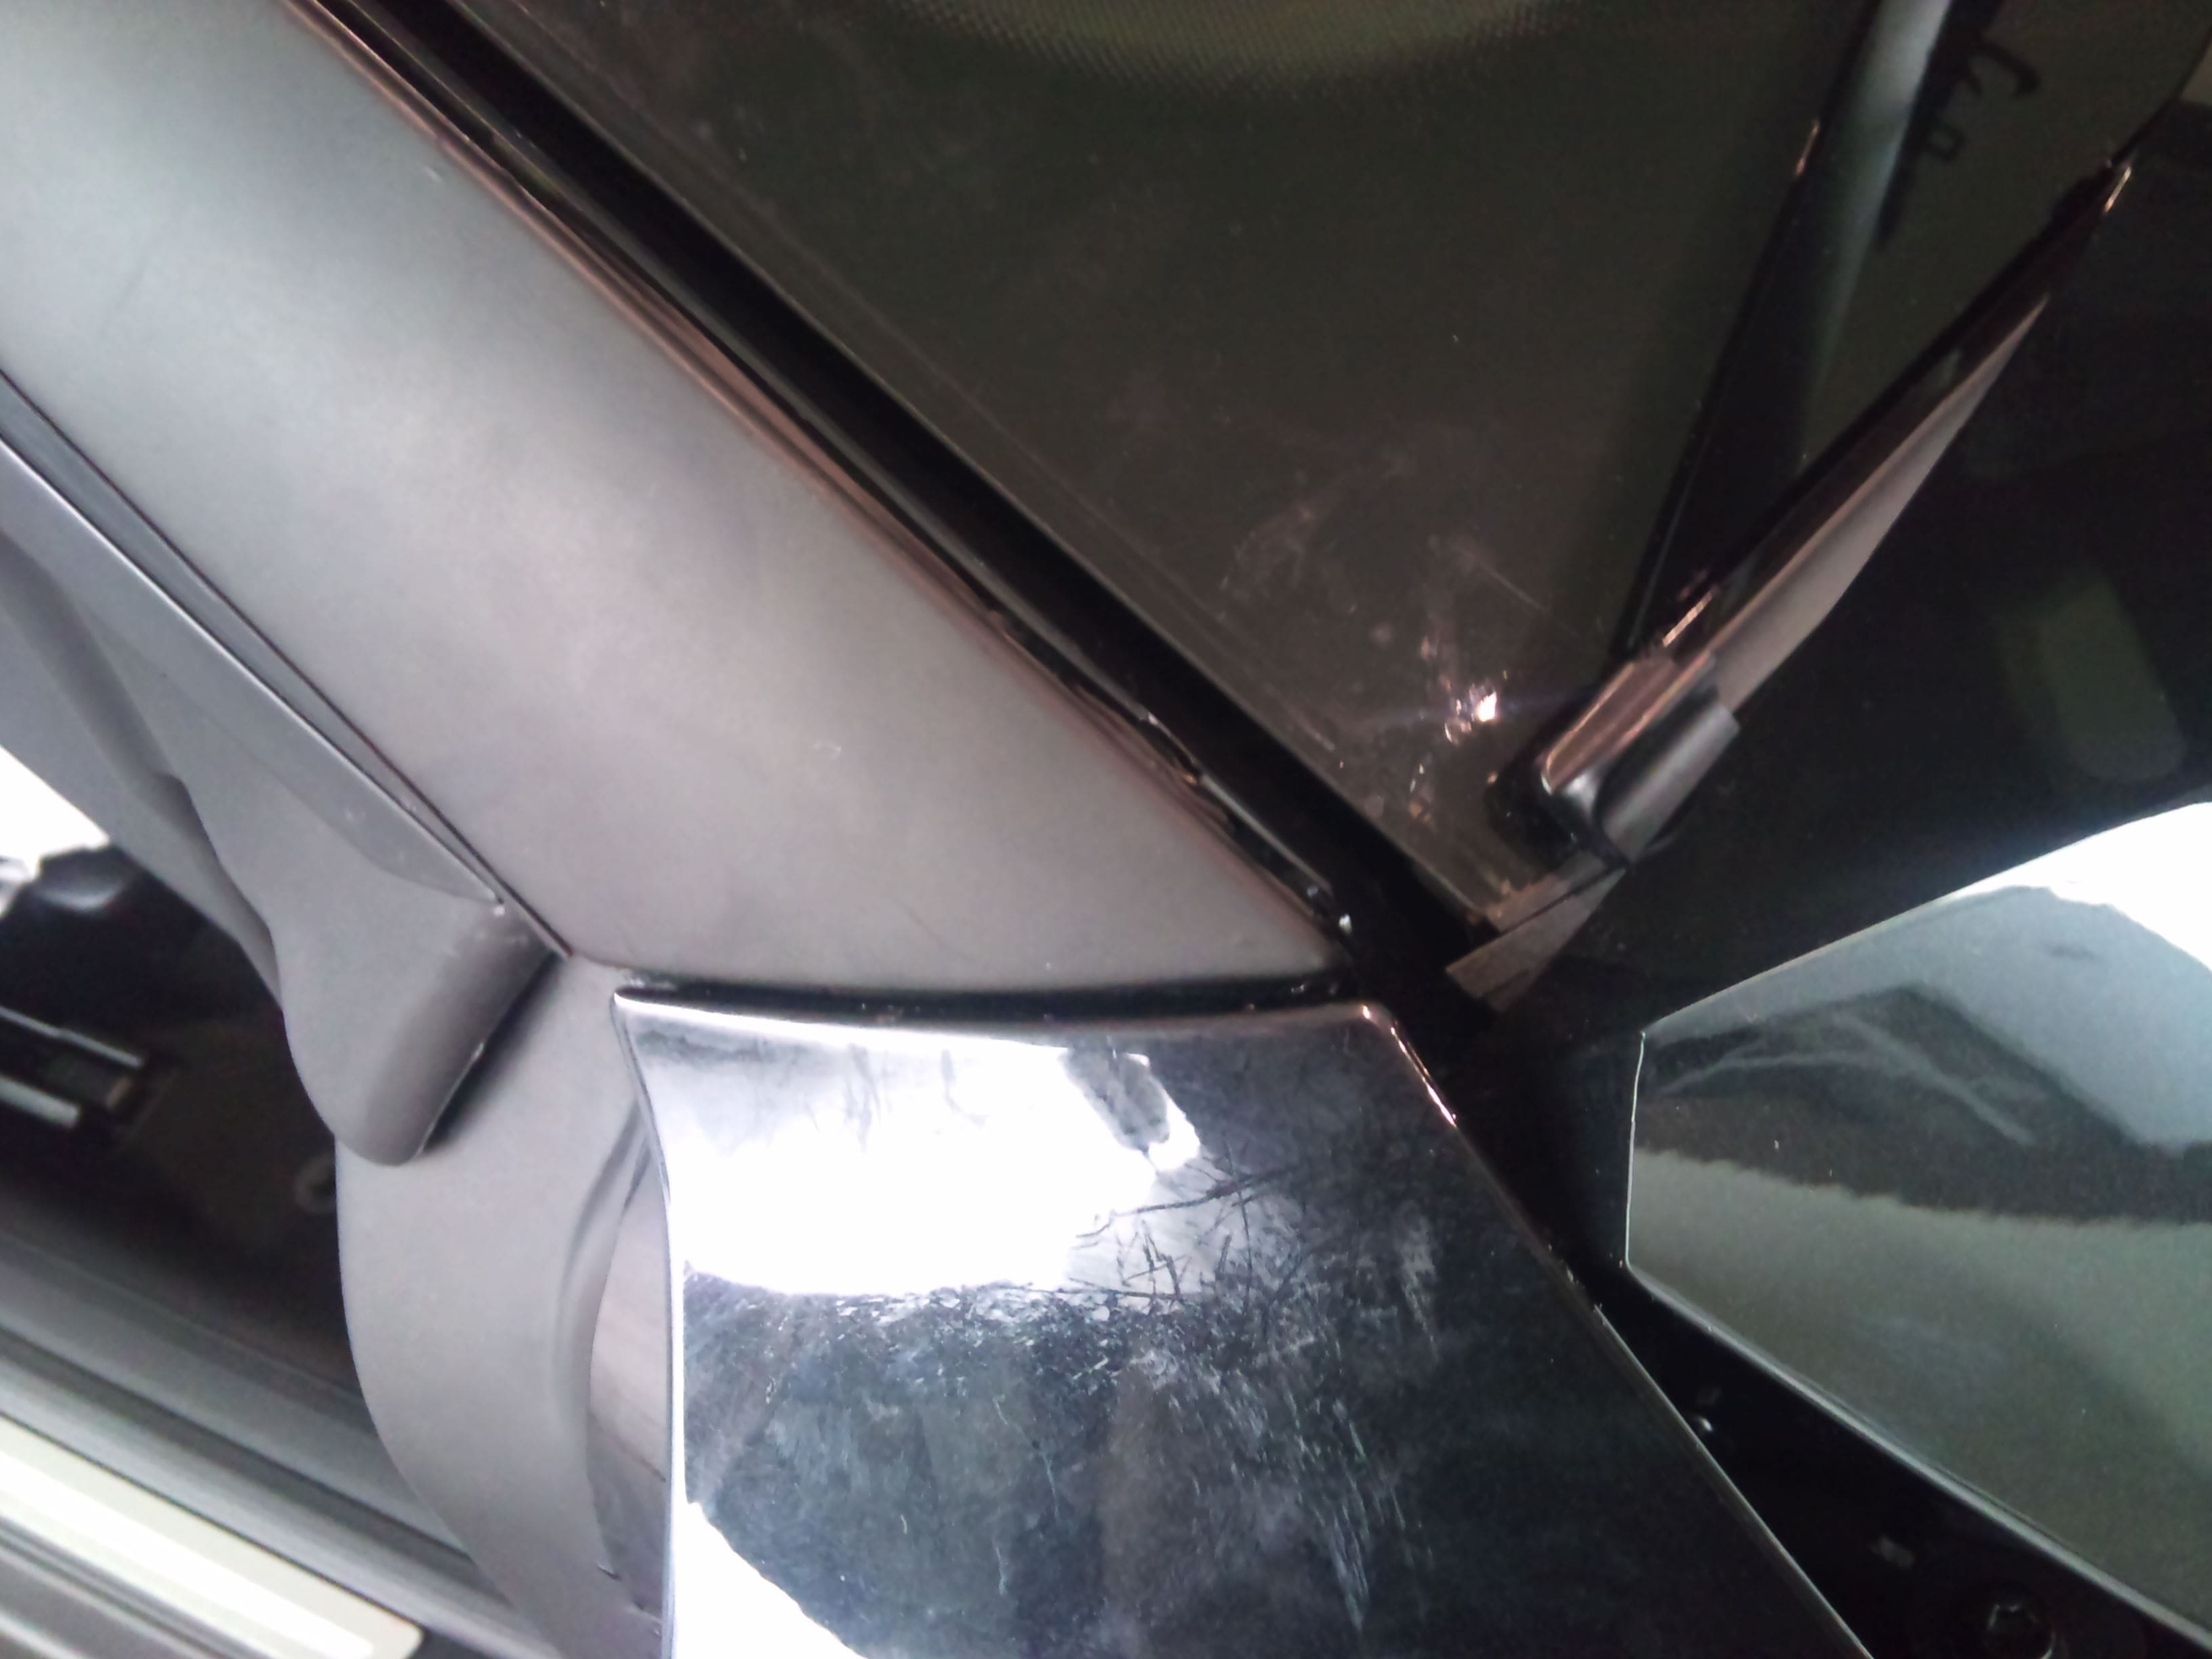 Audi A5 Coupe met Mat Zwarte Wrap, Carwrapping door Wrapmyride.nu Foto-nr:4550, ©2021